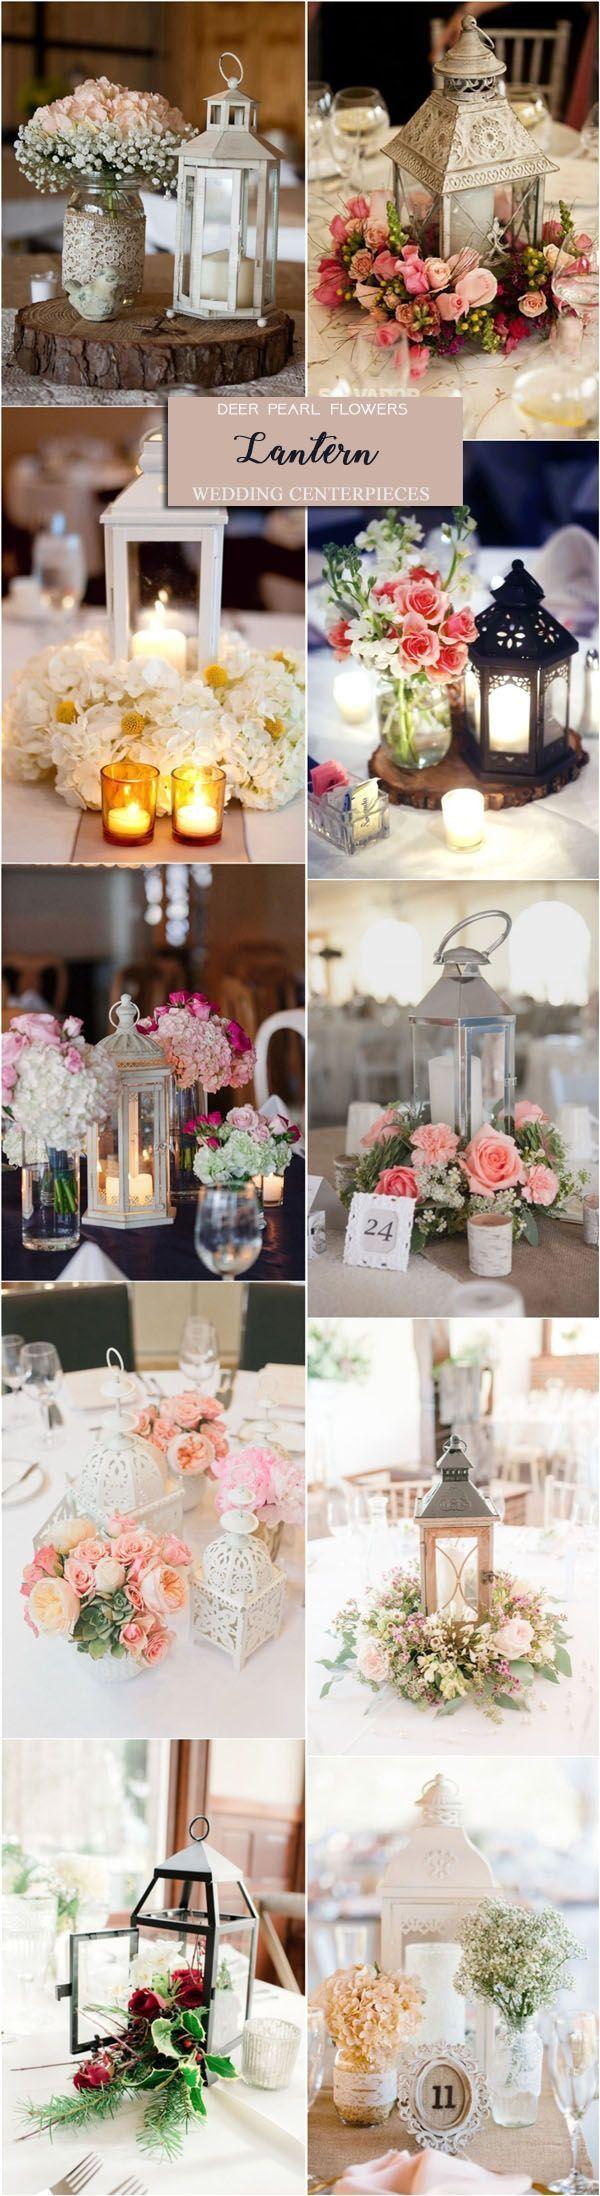 50s wedding decoration ideas   Insanely Wedding Centerpiece Ideas Youull Love  Wedding ideas